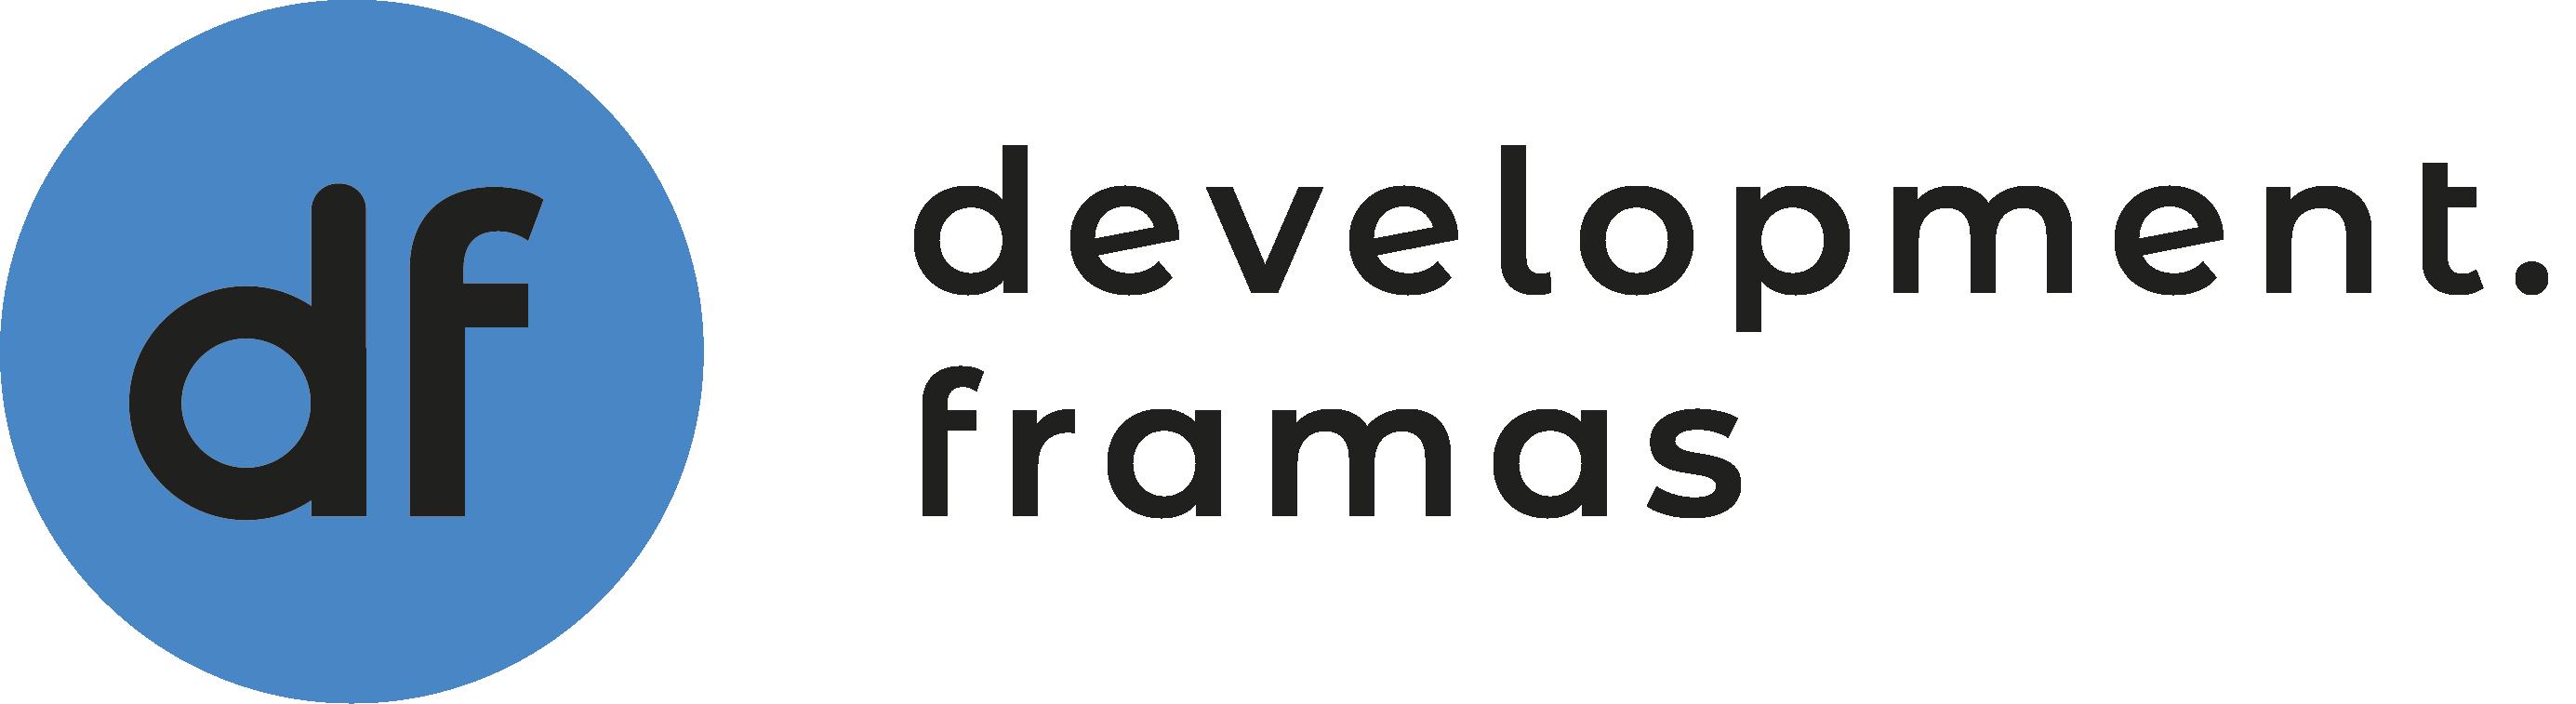 development.framas logo